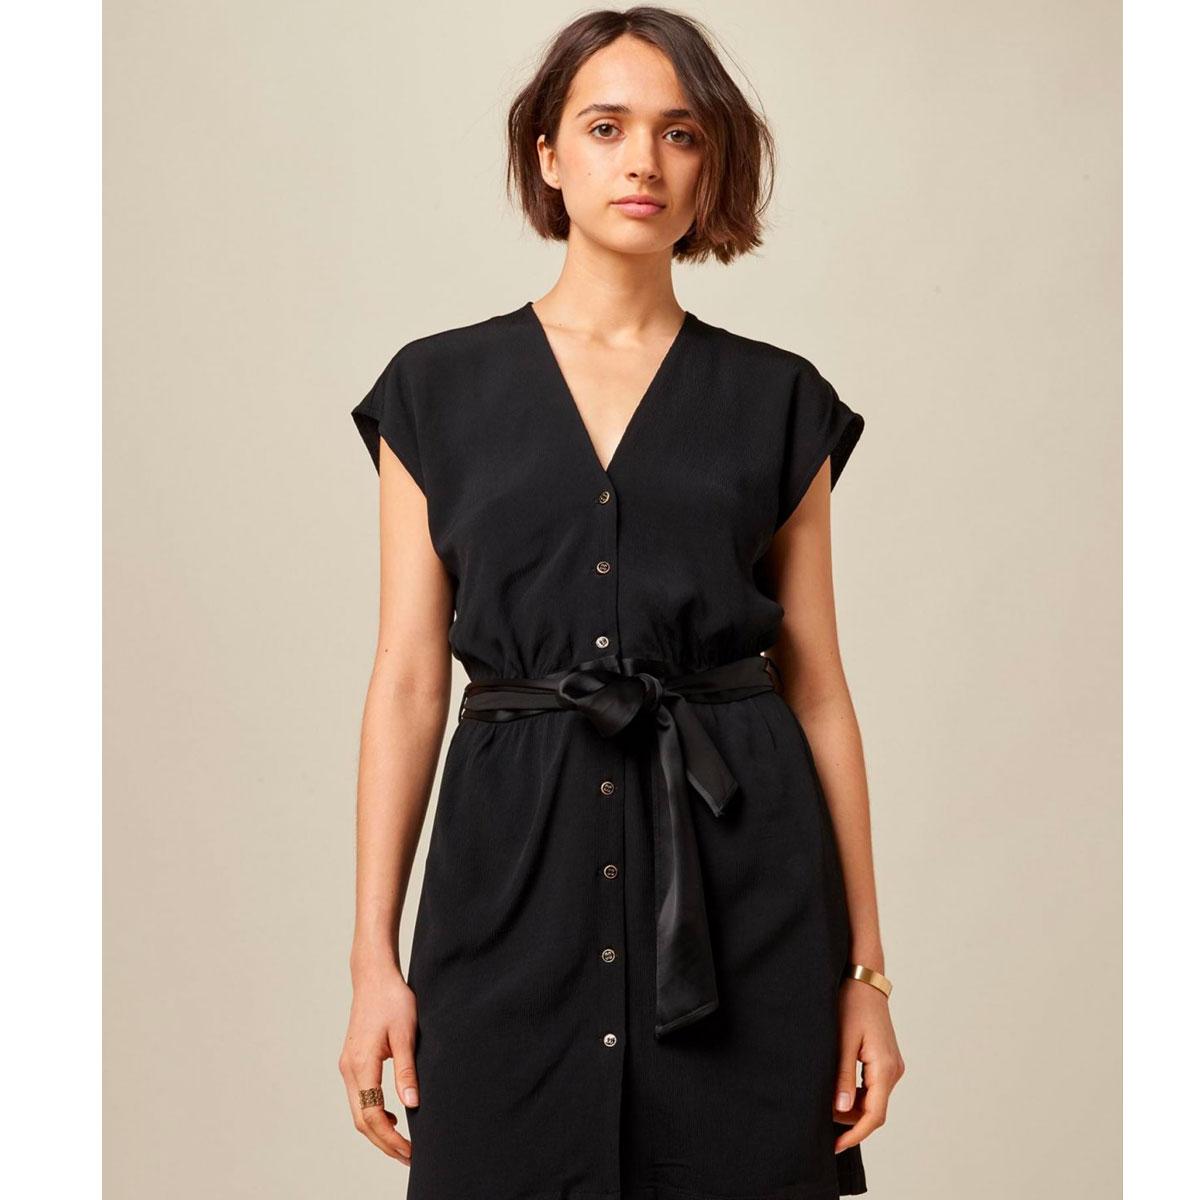 Robe ESPERANZA Black